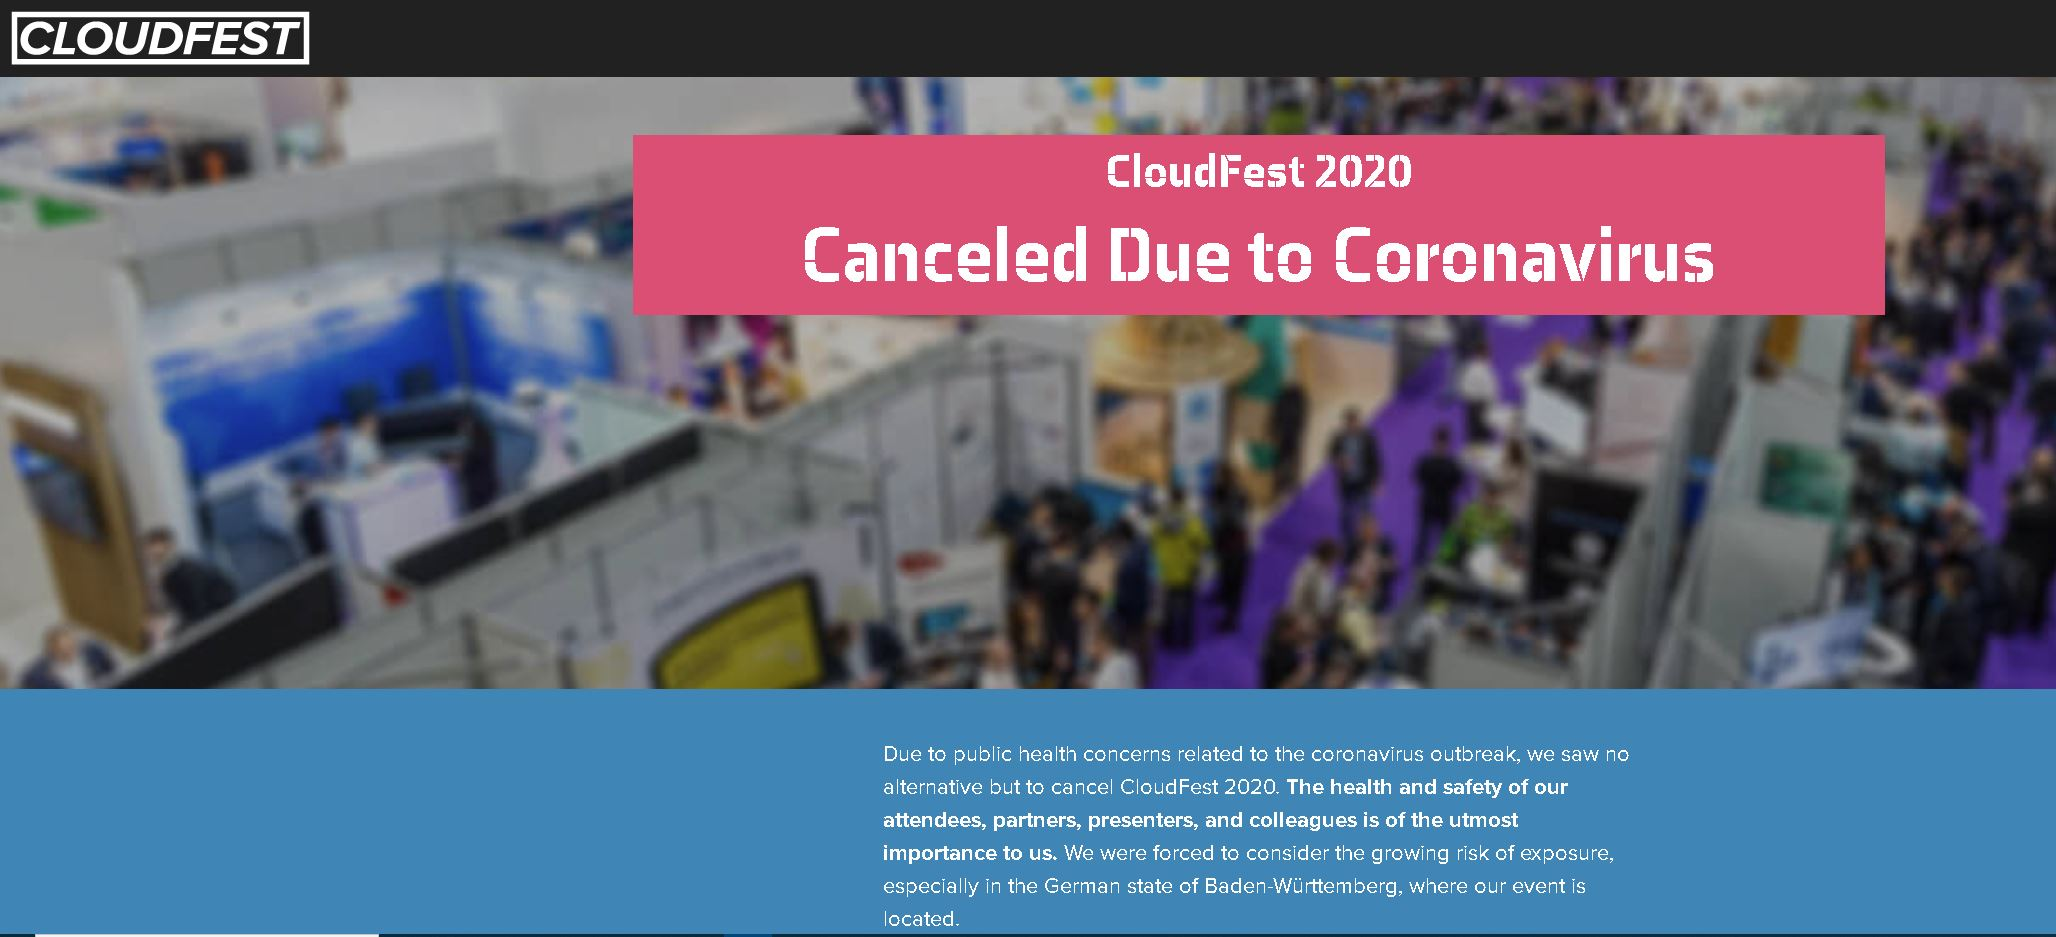 CloudFest 2020 is afgelast